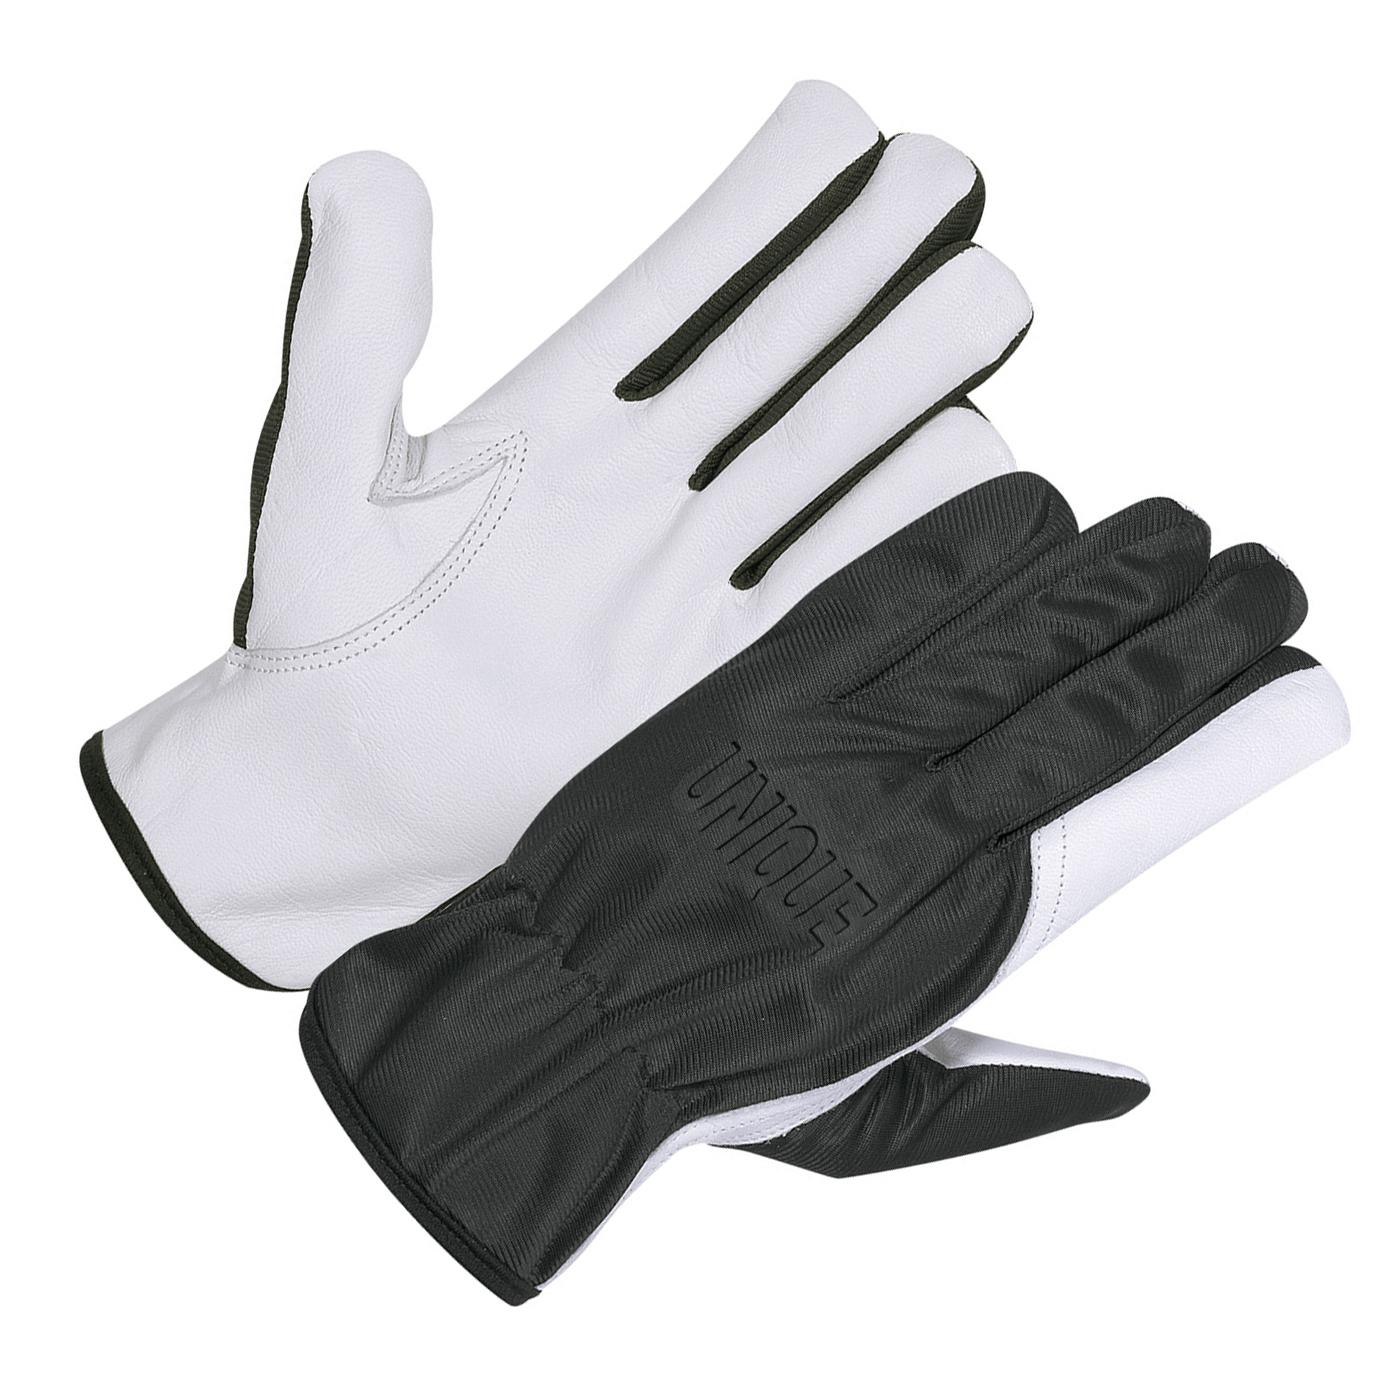 Goat Skin Work Glove With Black Nylon Cloth